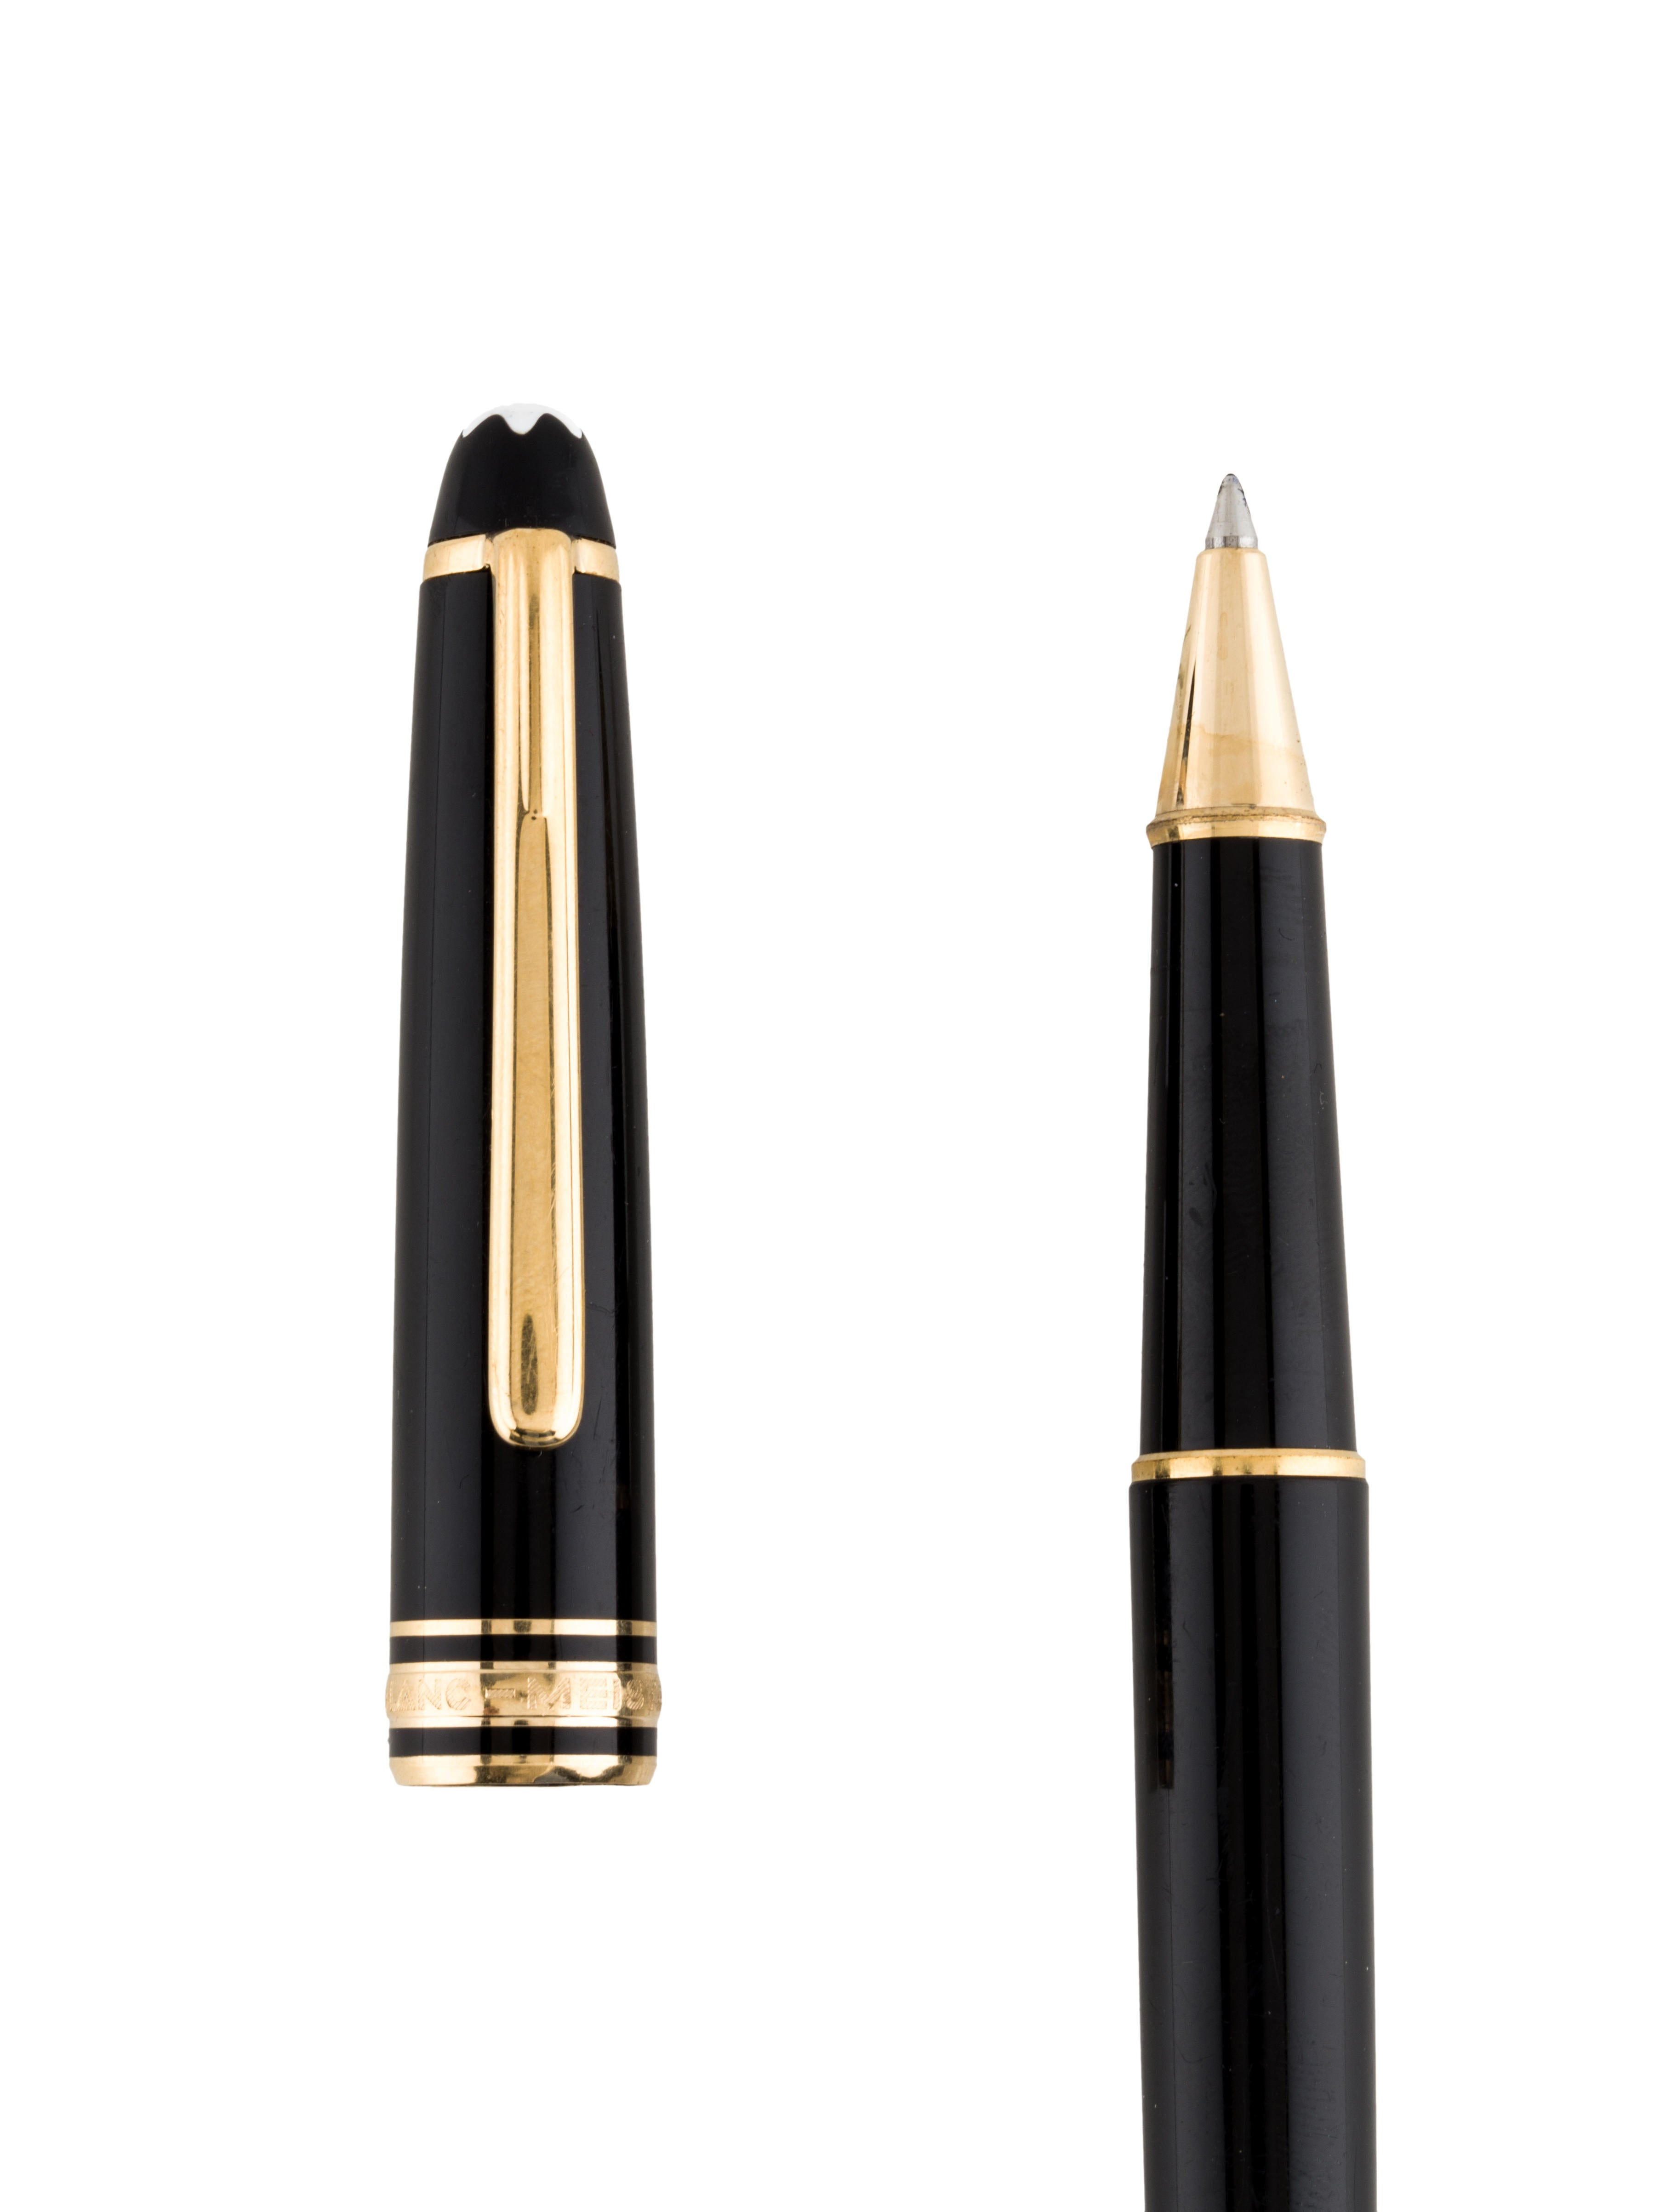 montblanc meisterst ck ballpoint pen accessories. Black Bedroom Furniture Sets. Home Design Ideas